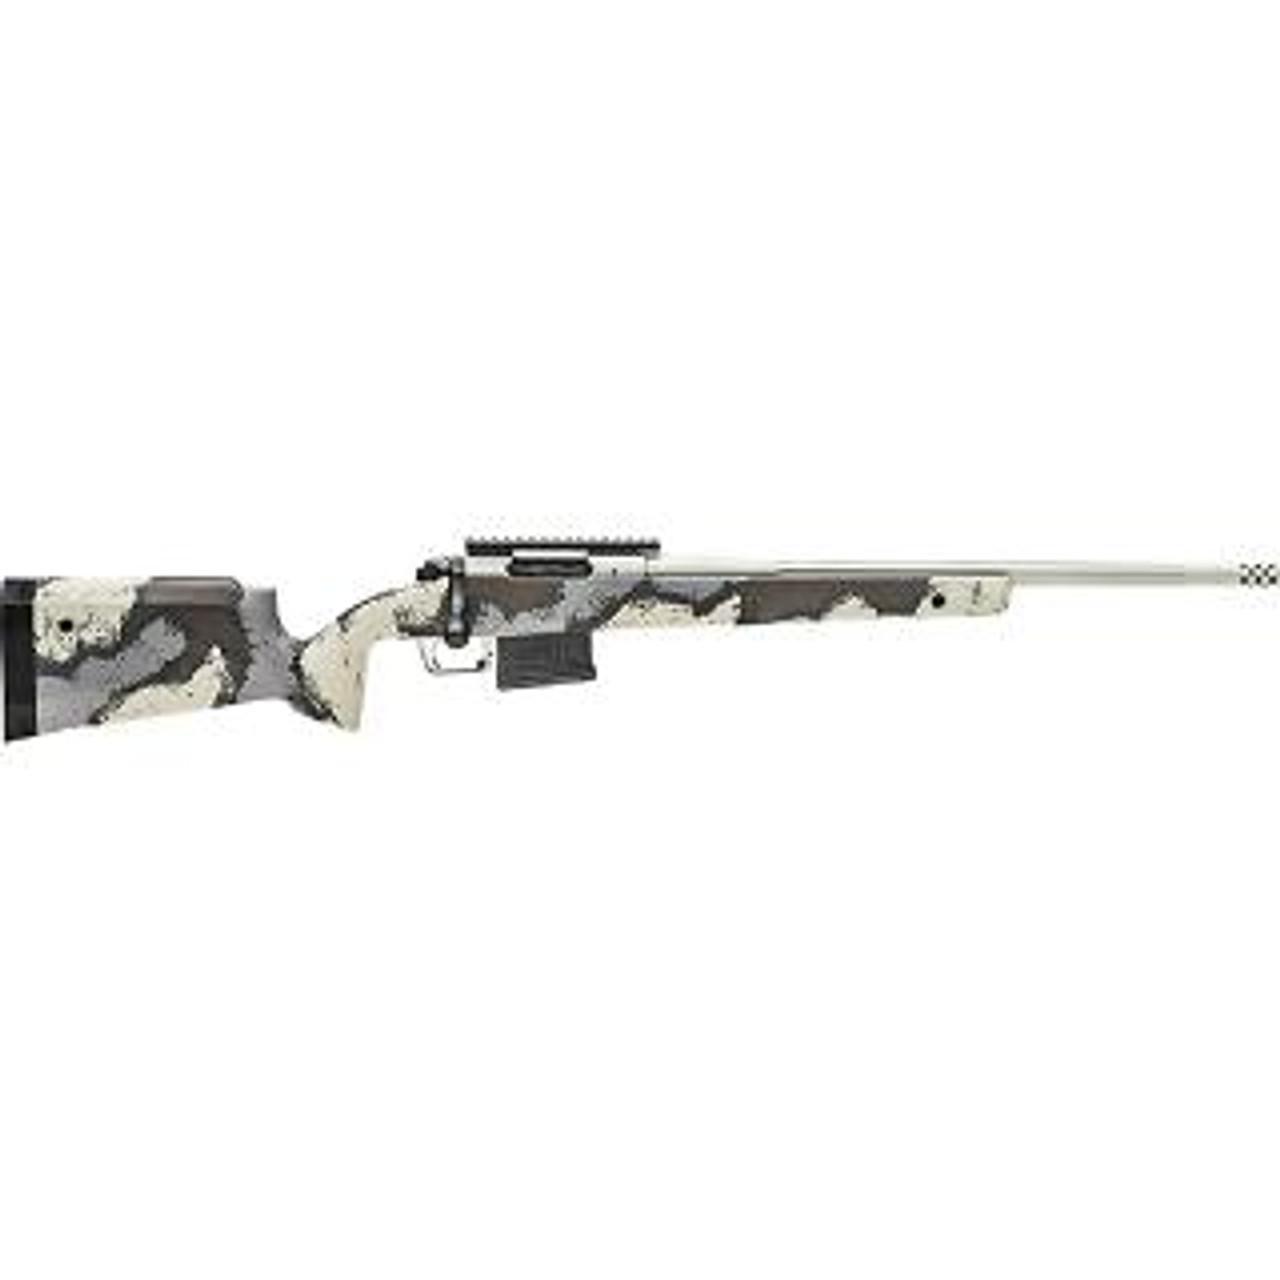 Springfield Model 2020 Waypoint SS CALIFORNIA LEGAL - .308/7.62x51 - Ridgeline Camo